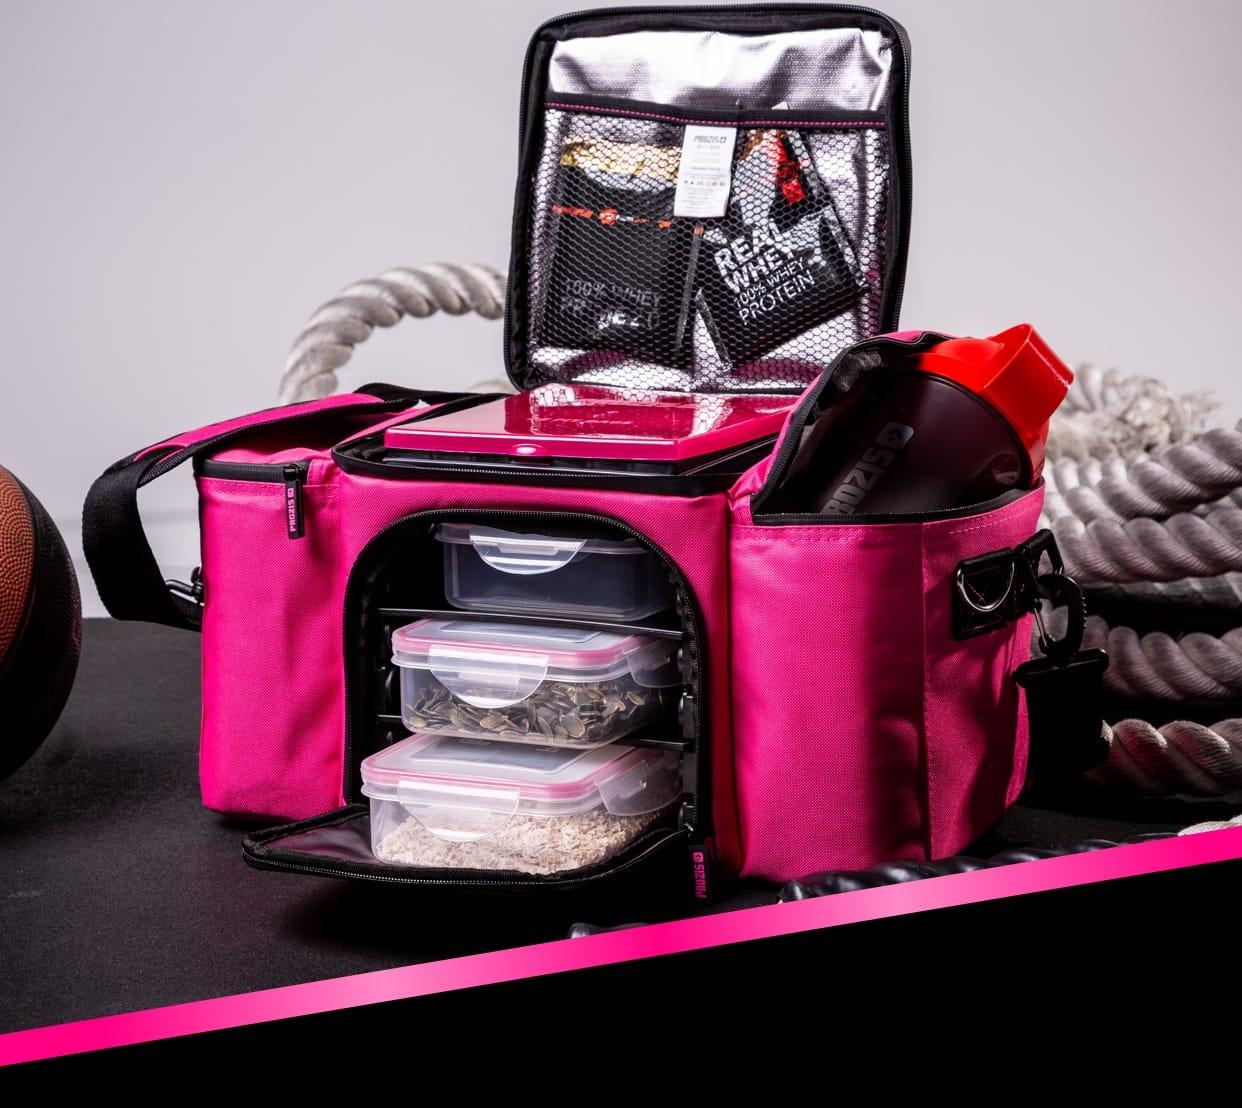 Prozis Lancheira Befit Bag 2.0 Pink Edition